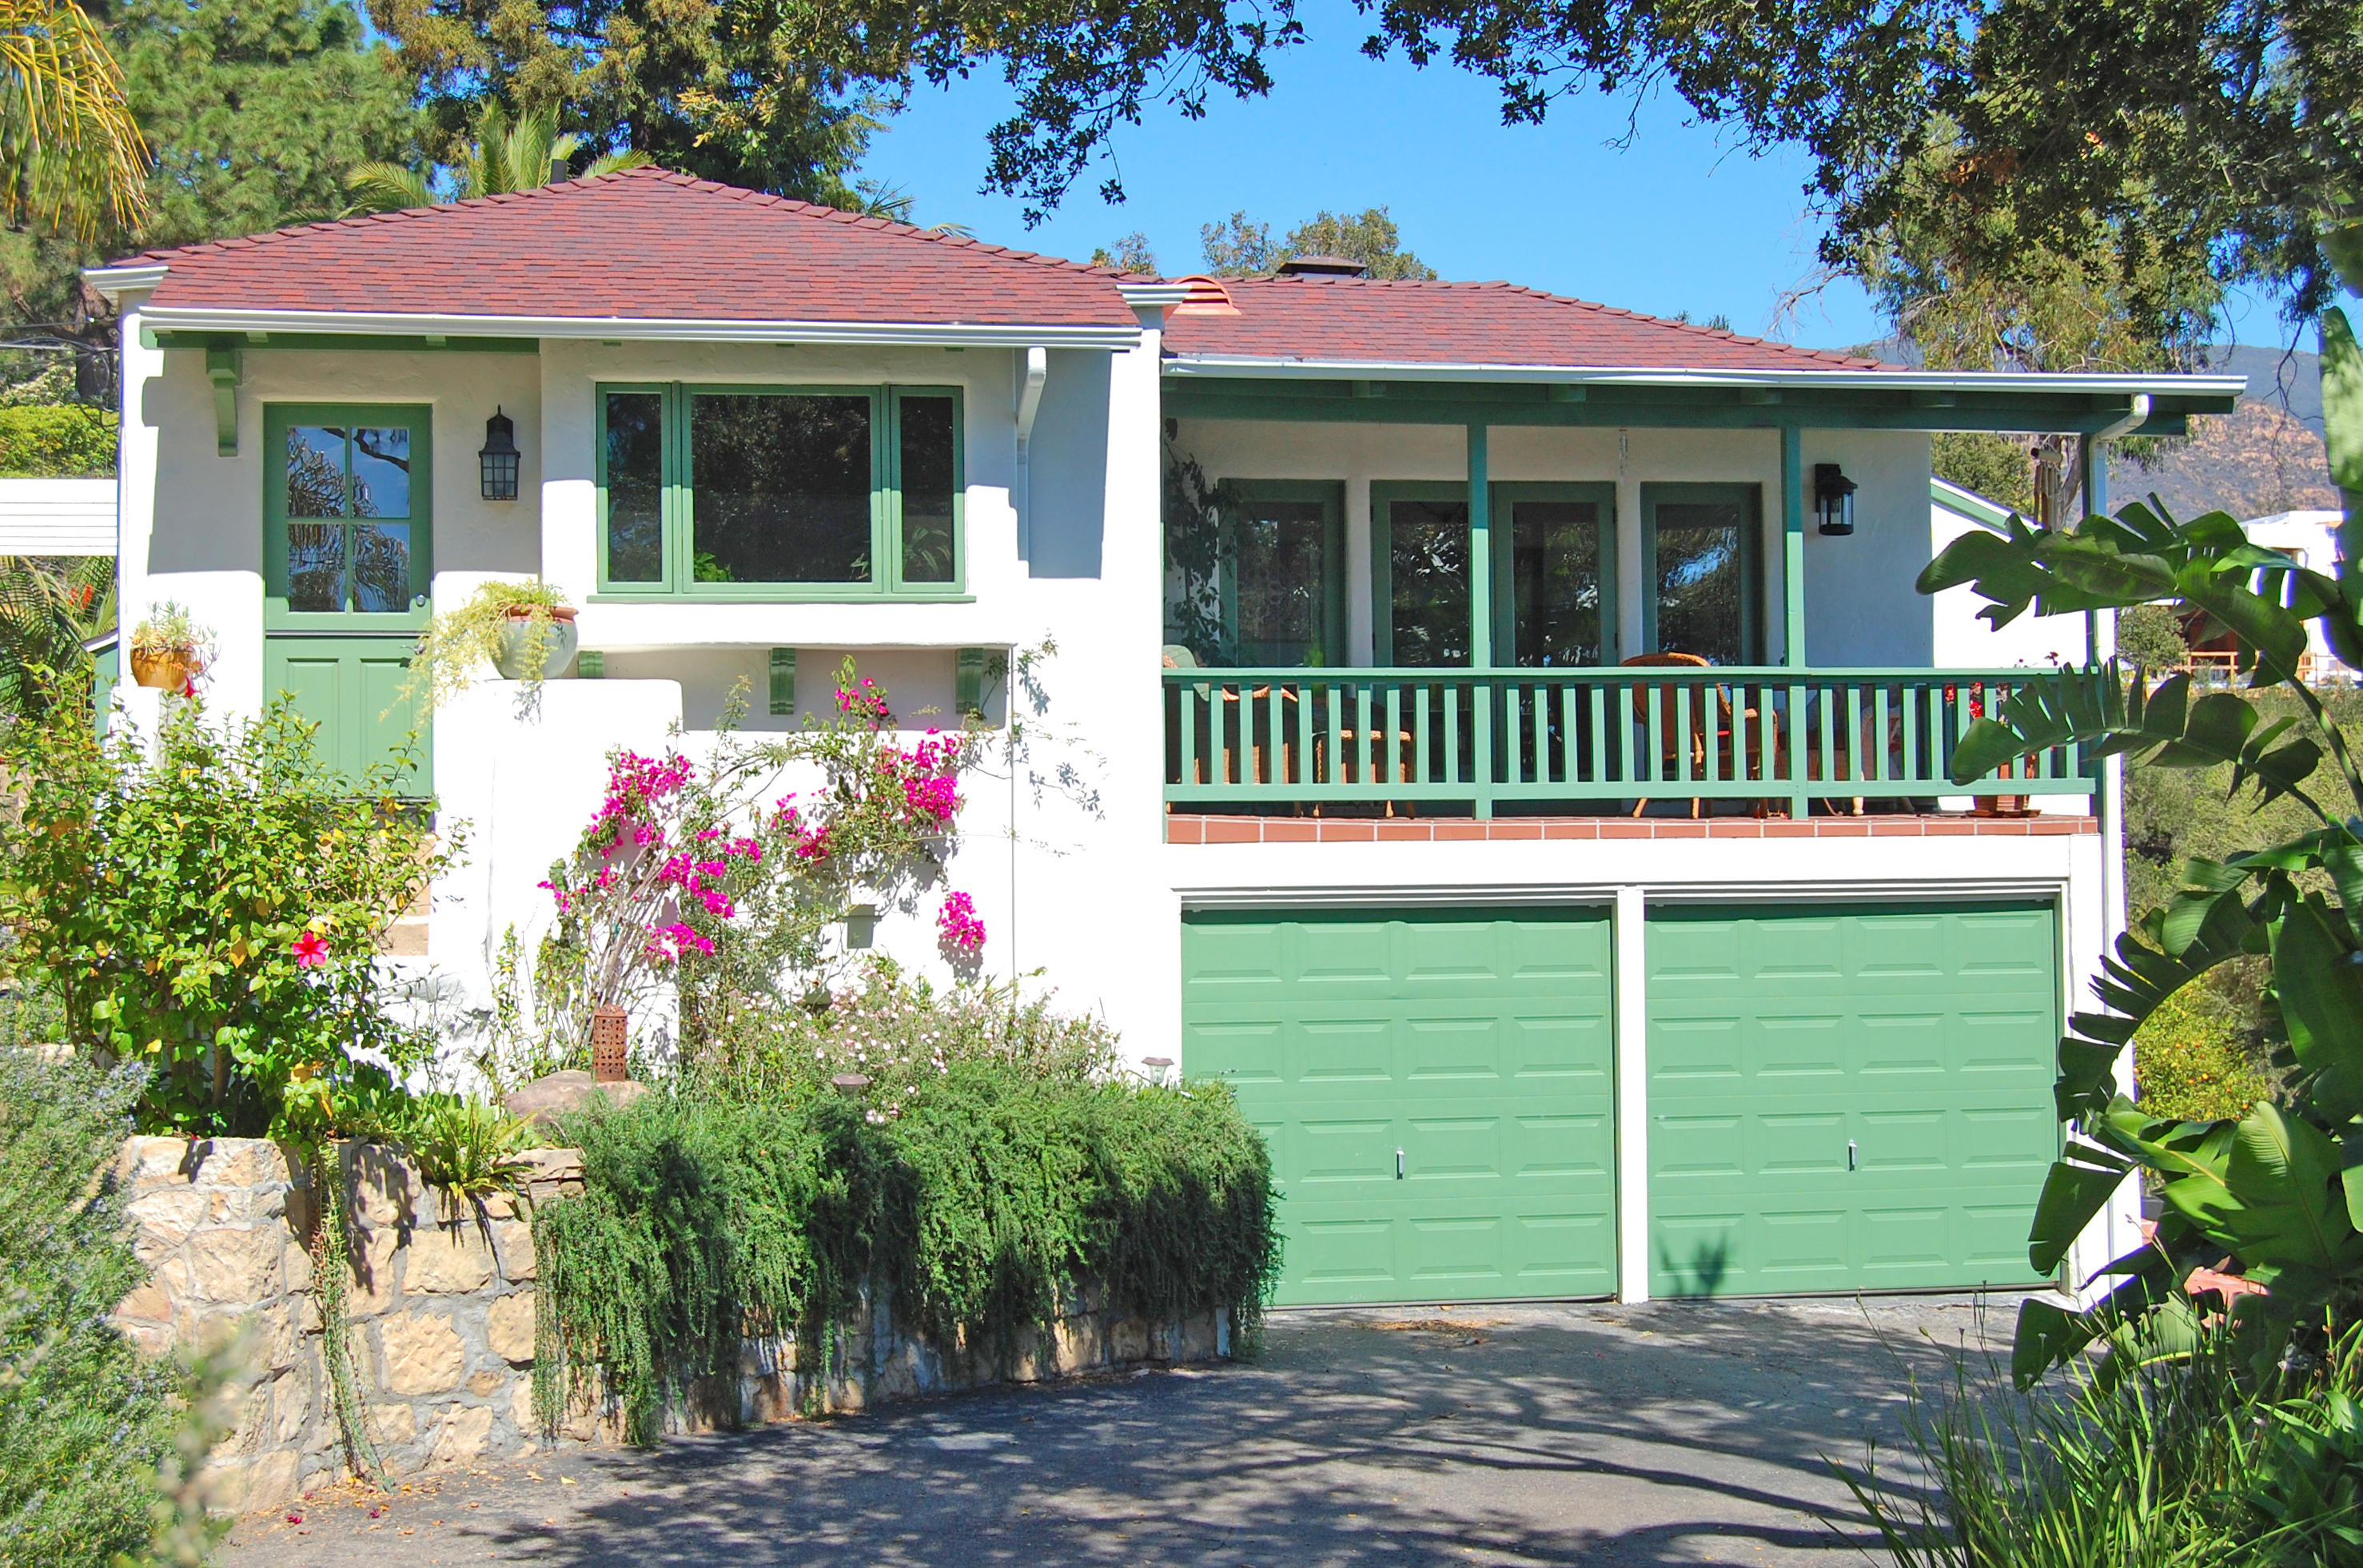 Property photo for 1181 Las Alturas Rd Santa Barbara, California 93103 - 14-749